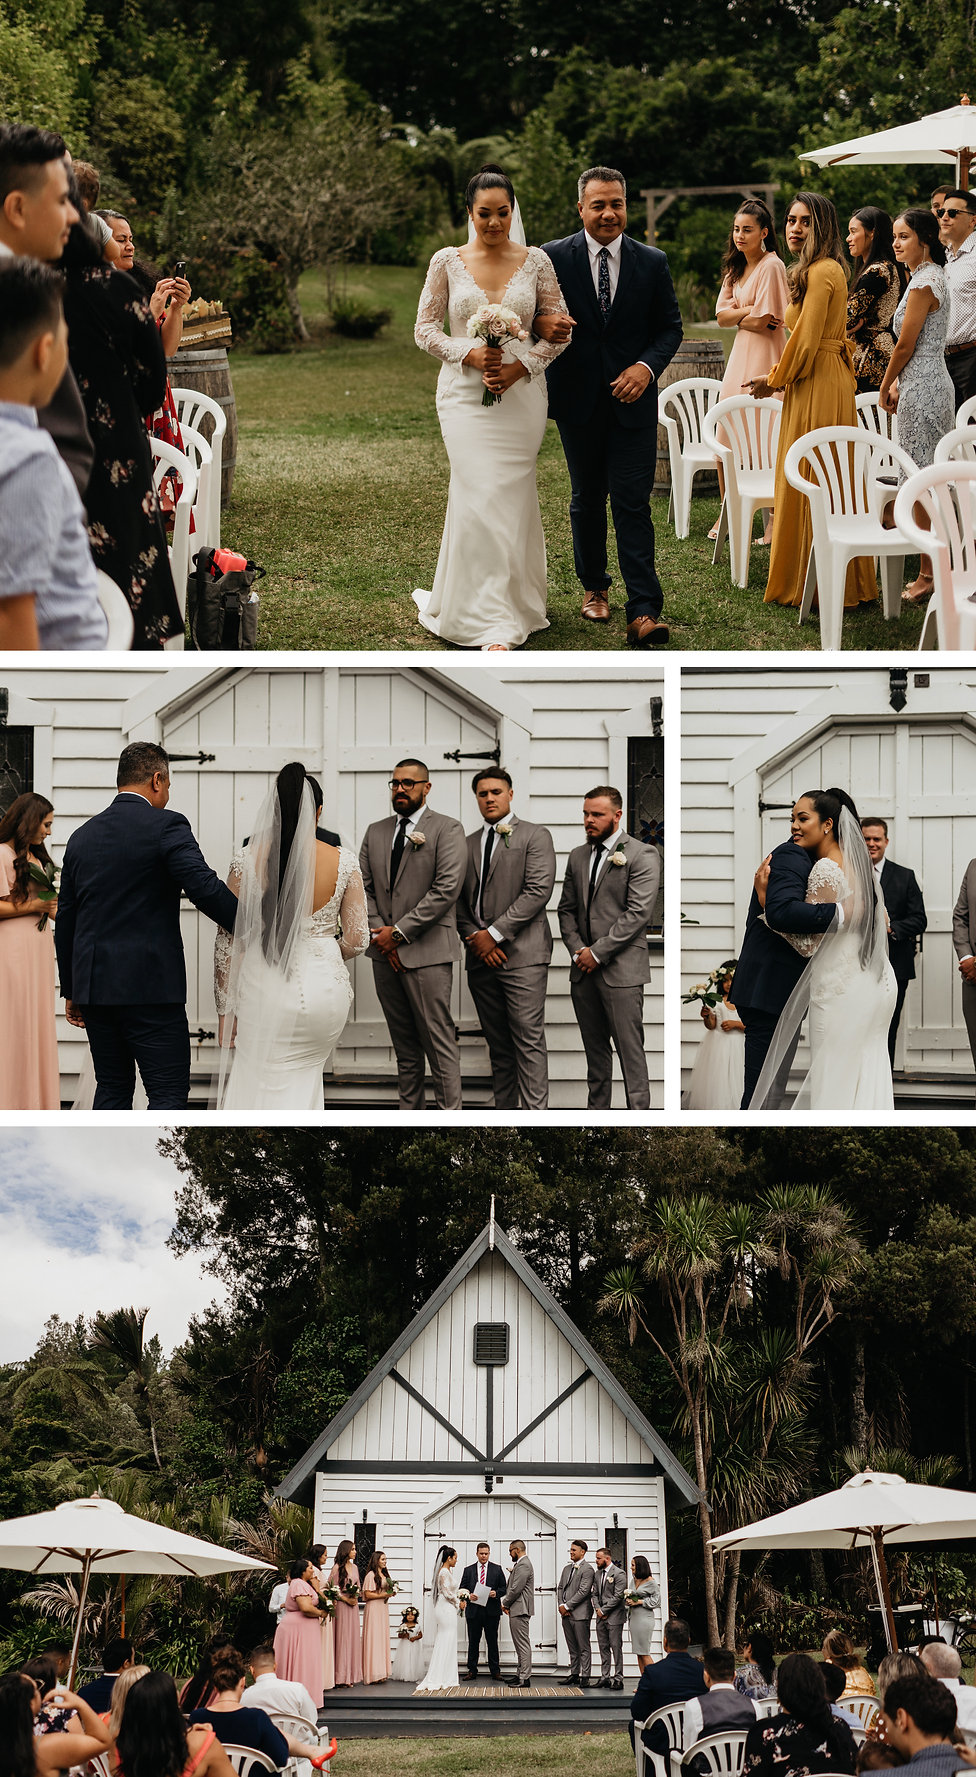 bride arrival at bridgewater estate in west auckland, new zealand, wedding venue, captured by wanderlusting lovers